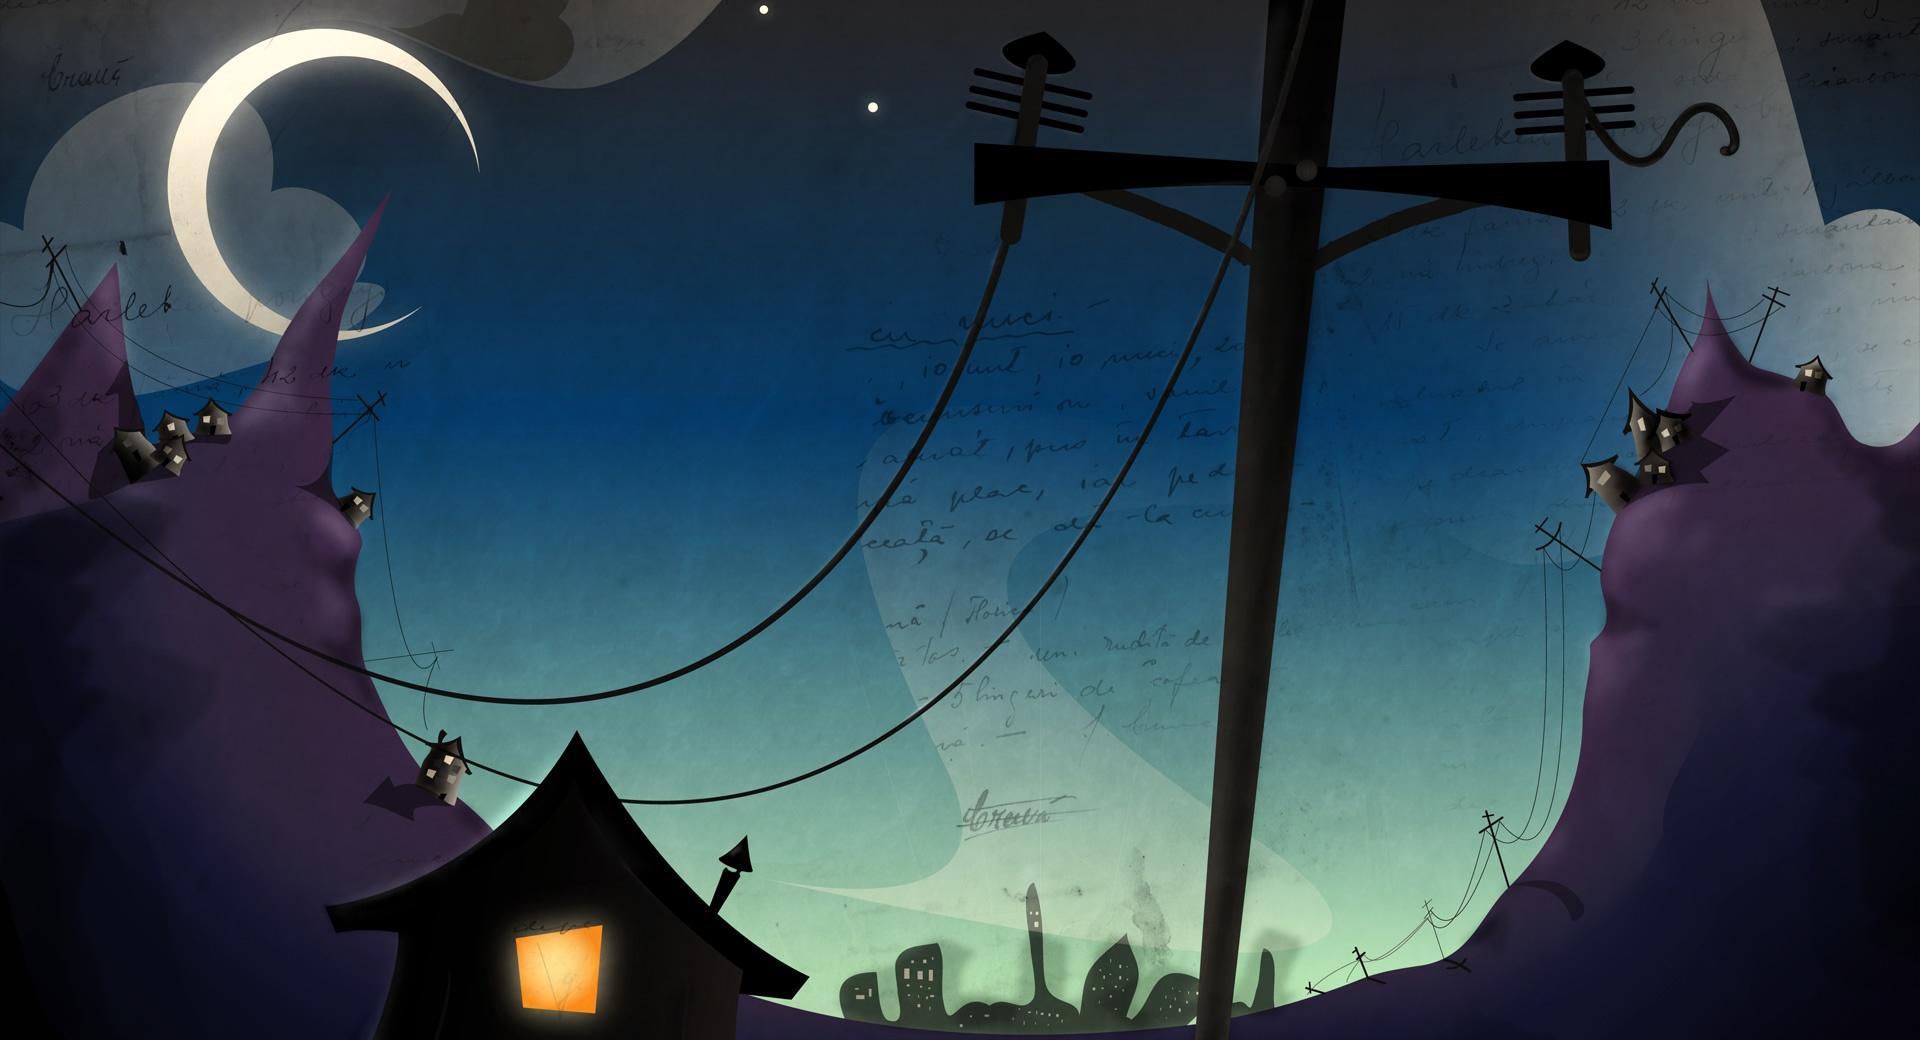 Dark Cartoon Art wallpapers HD quality